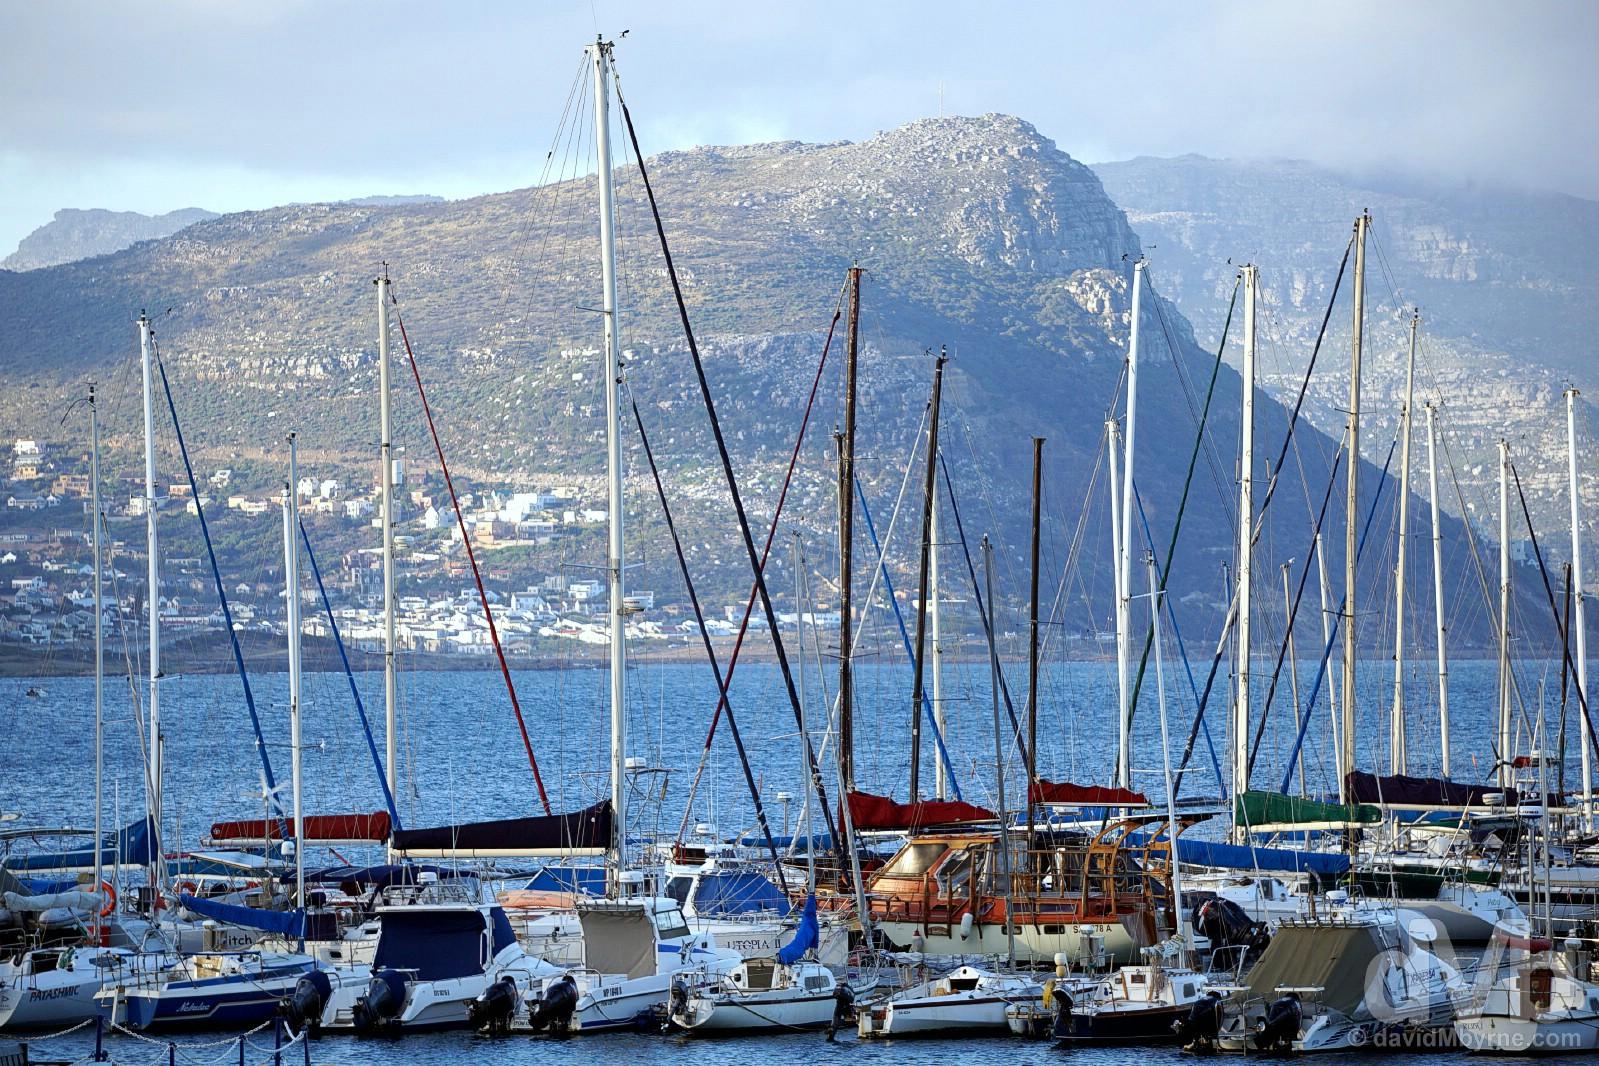 The marina of Simon's Town on False Bay, Cape Peninsula, Western Cape, South Africa. February 17, 2017.